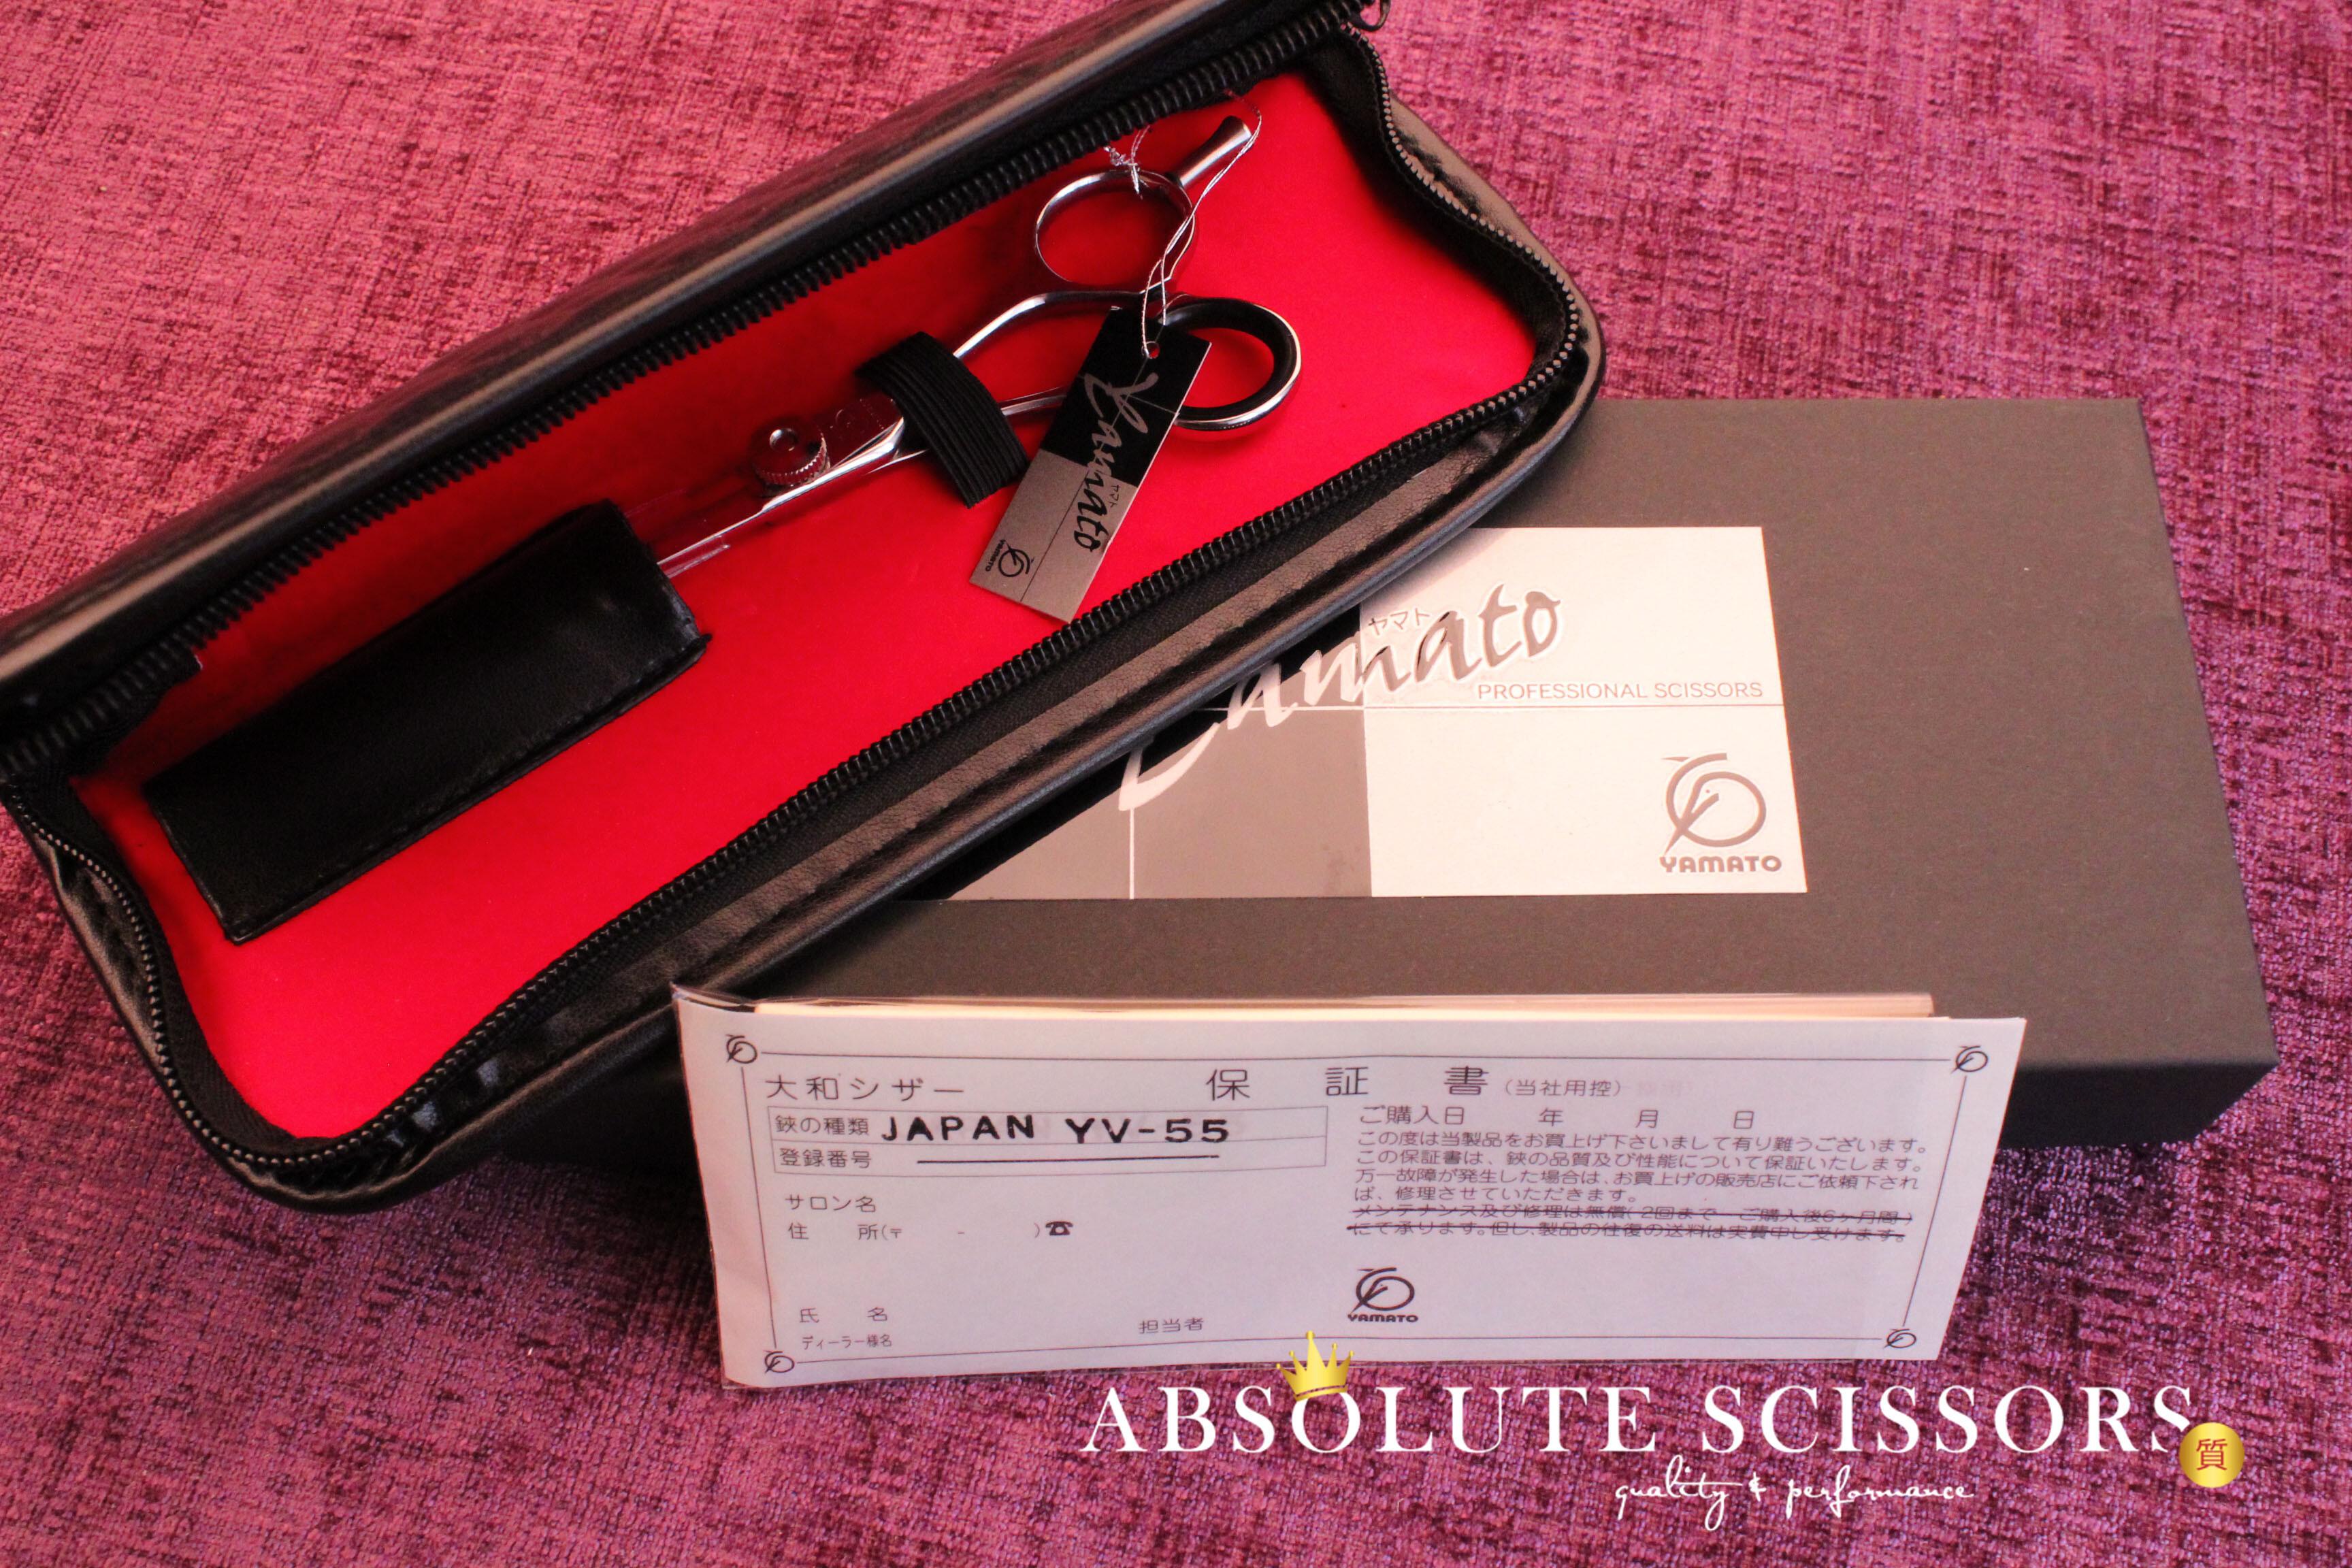 Elite YV55 3674 Yamato hair scissors size 5.5 inches